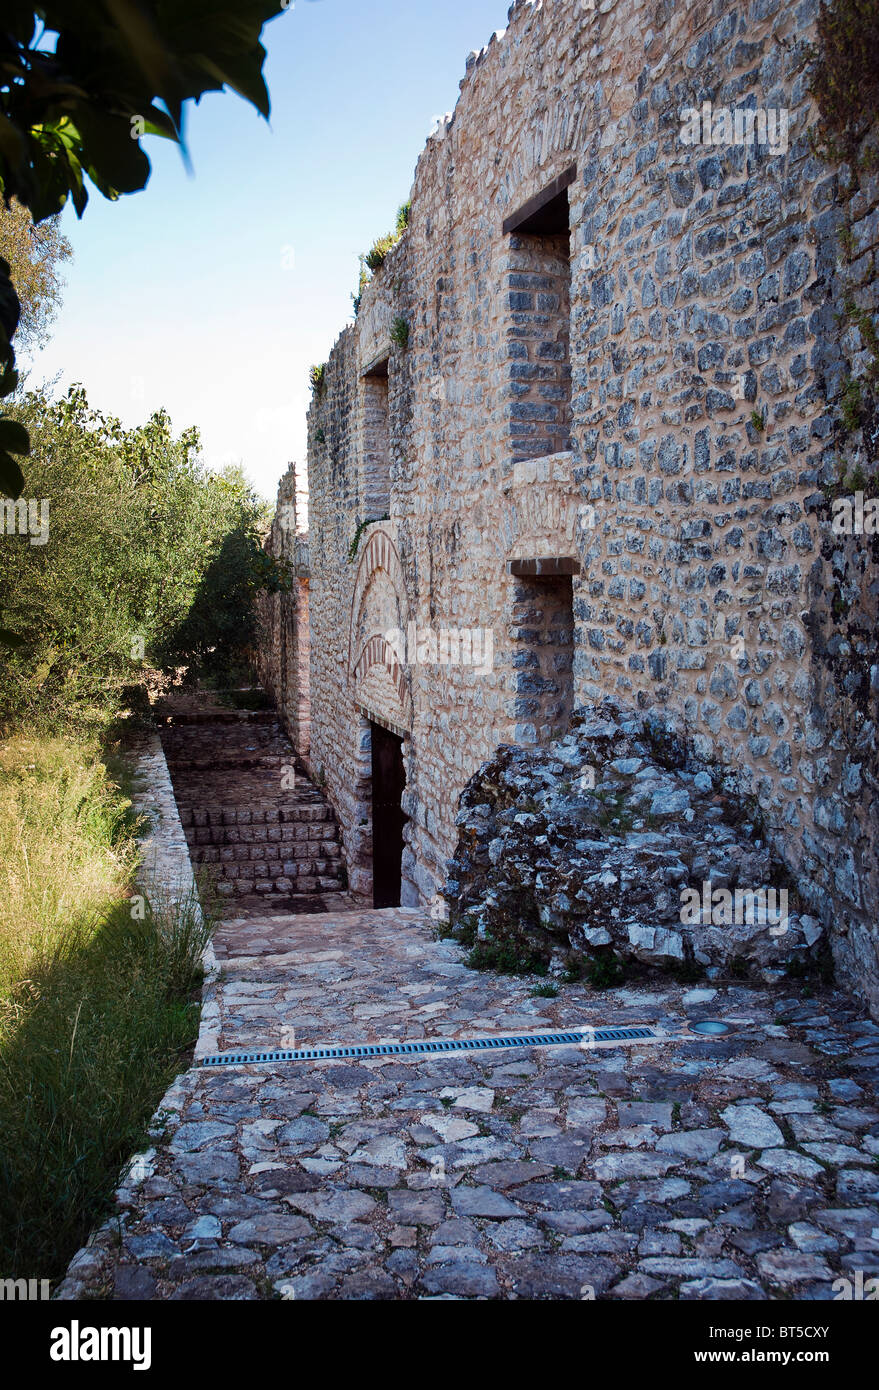 Interior of Castle at Kassiopi, Corfu, Ionian Islands Greece. - Stock Image